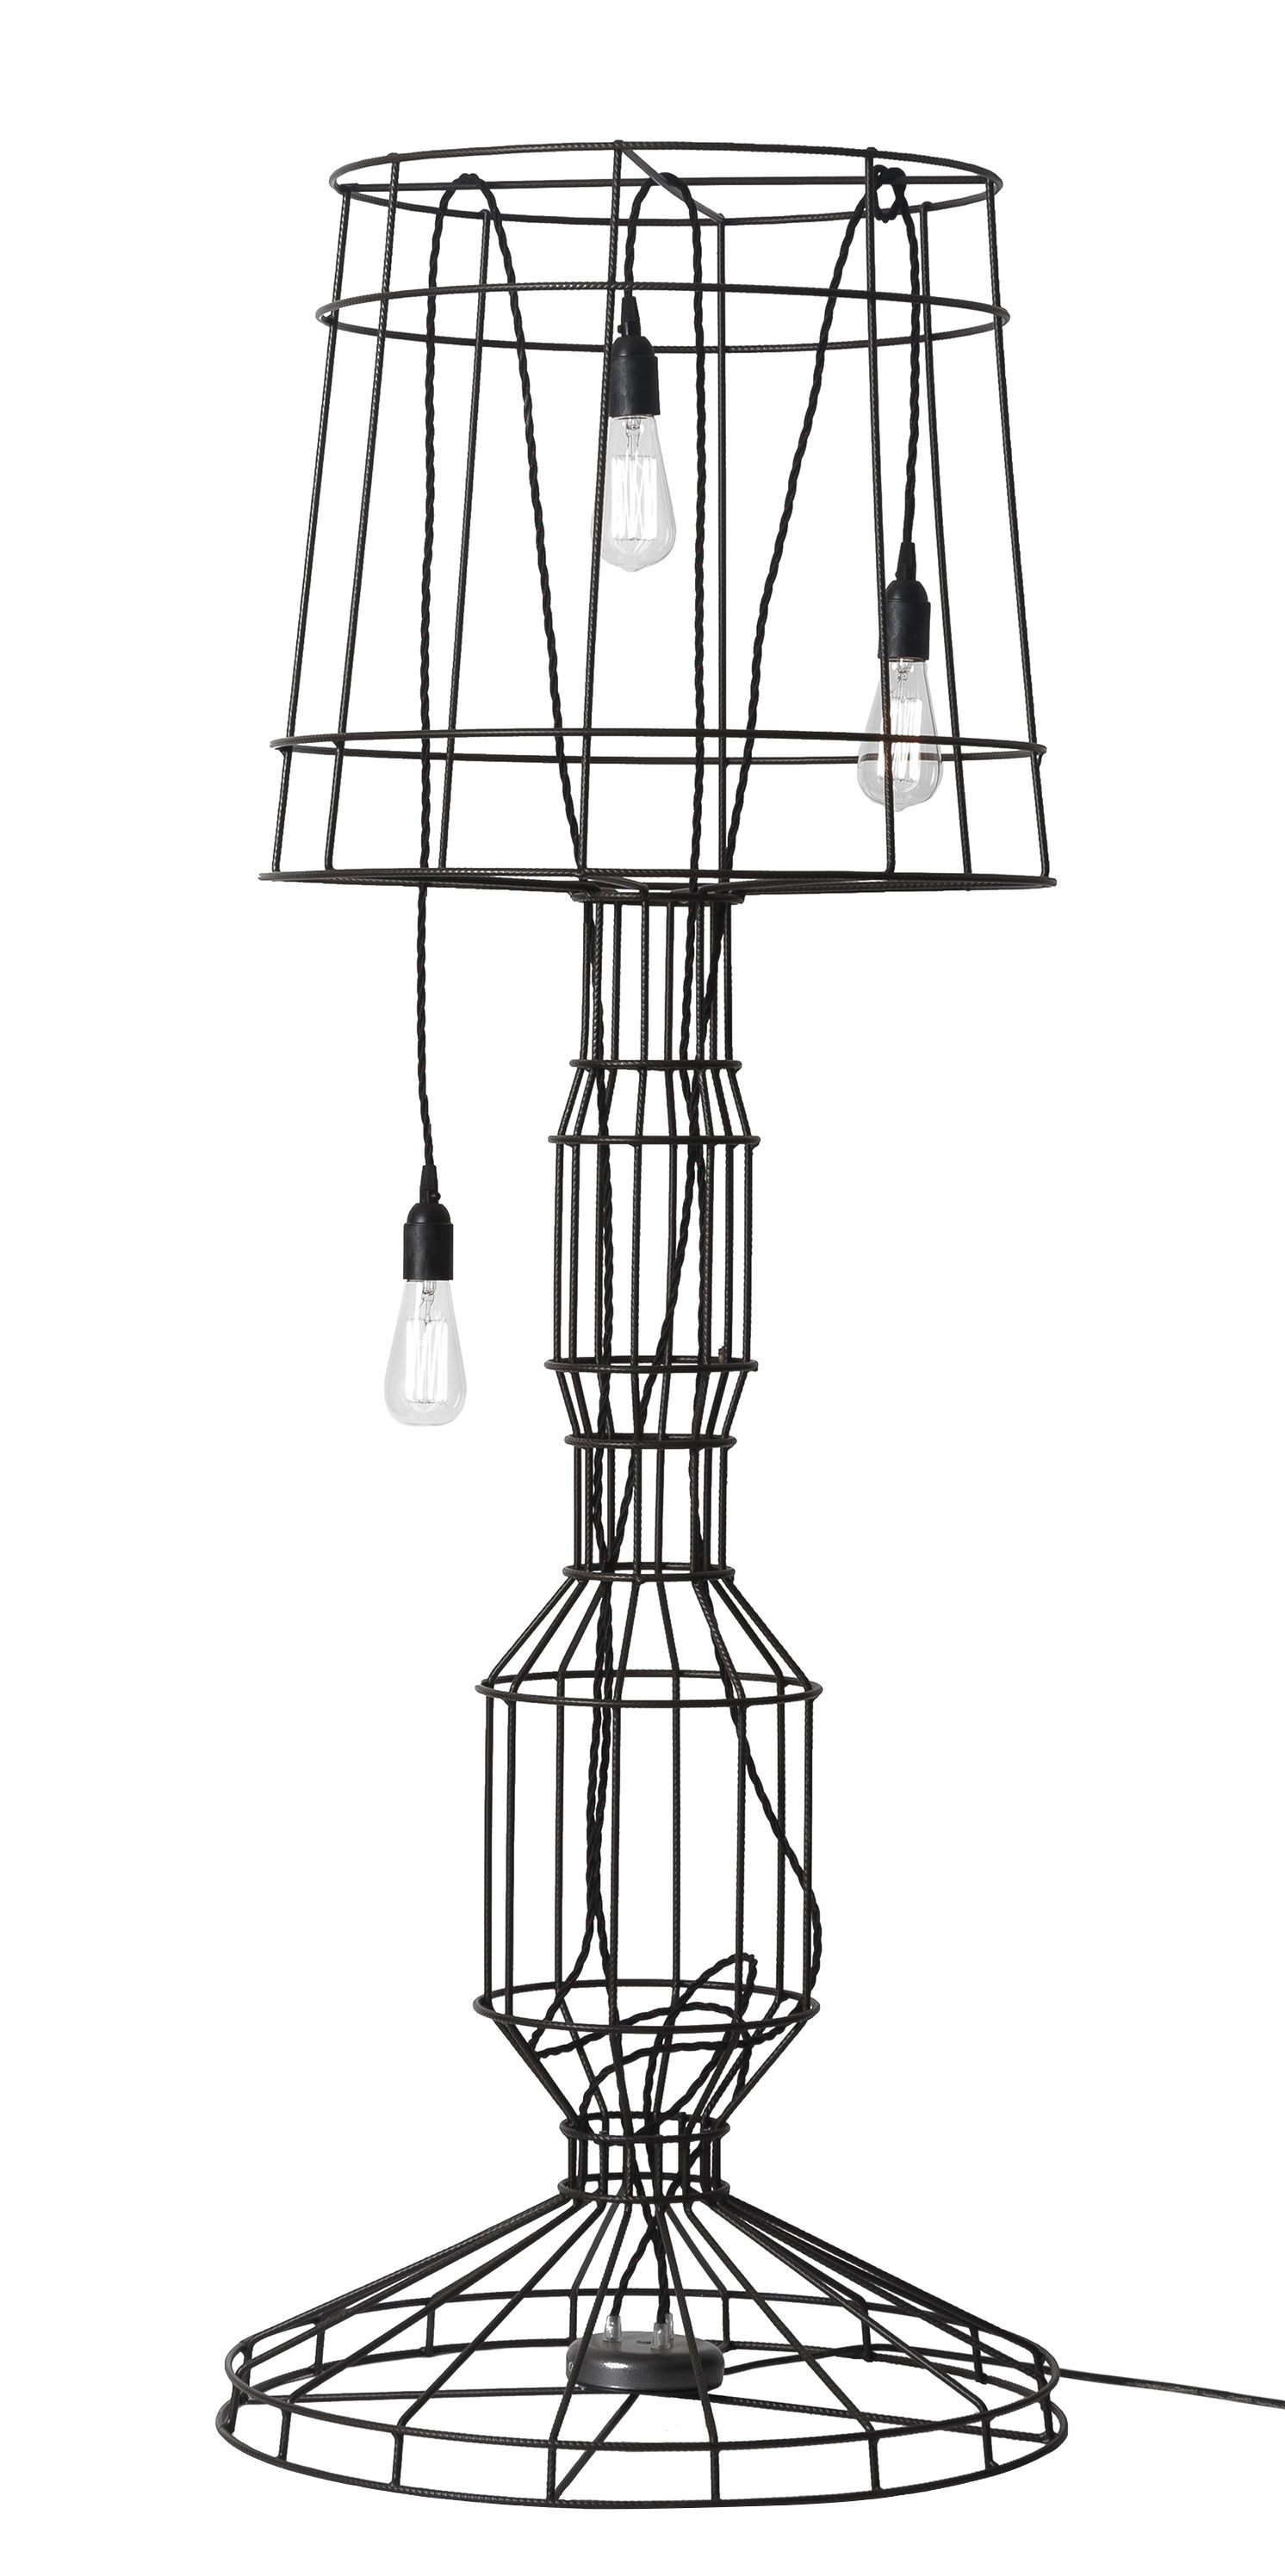 Lighting - Floor lamps - Sisma Floor lamp - H 166 cm by Karman - Anthracite - Steel